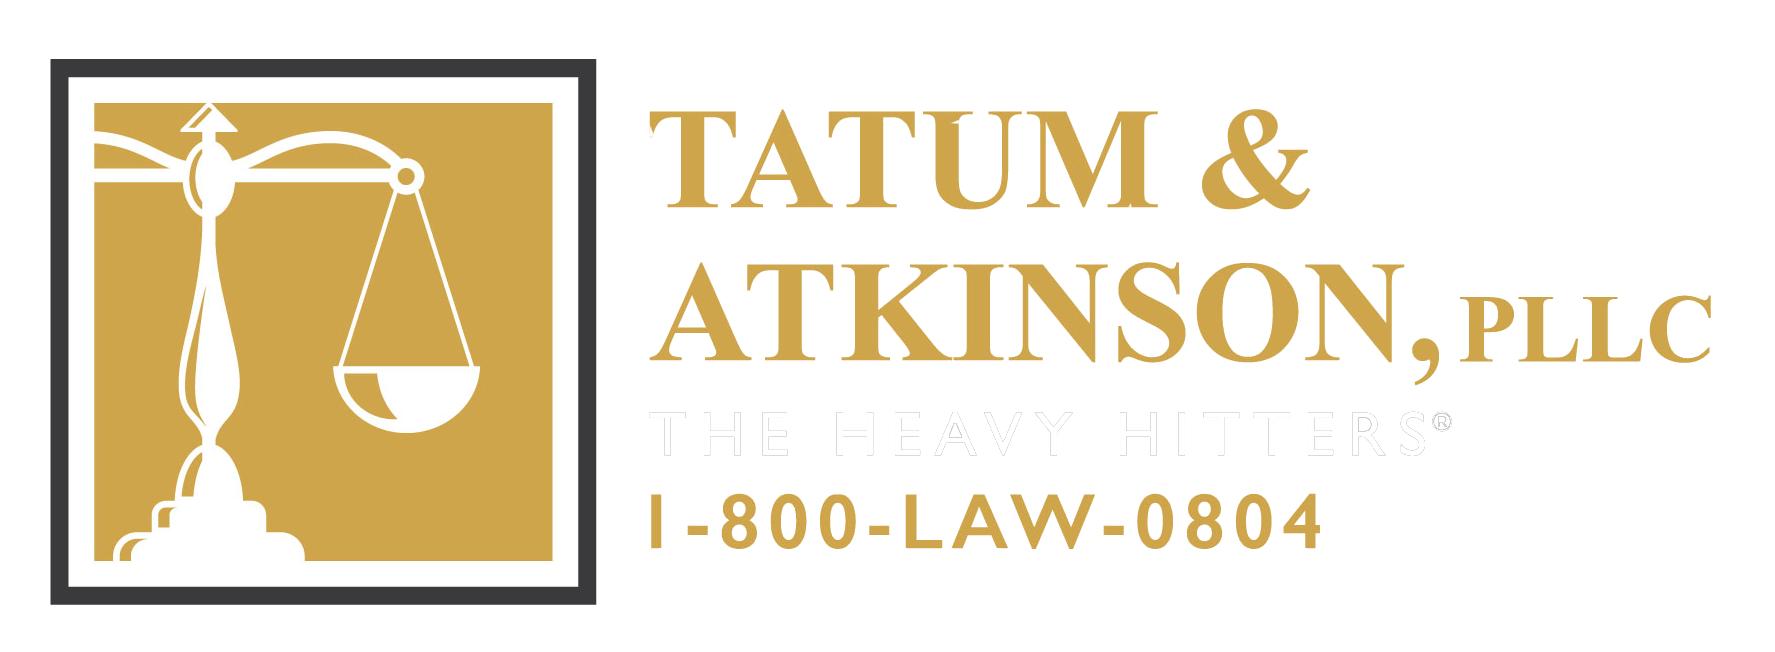 Tatum & Atkinson, PLLC